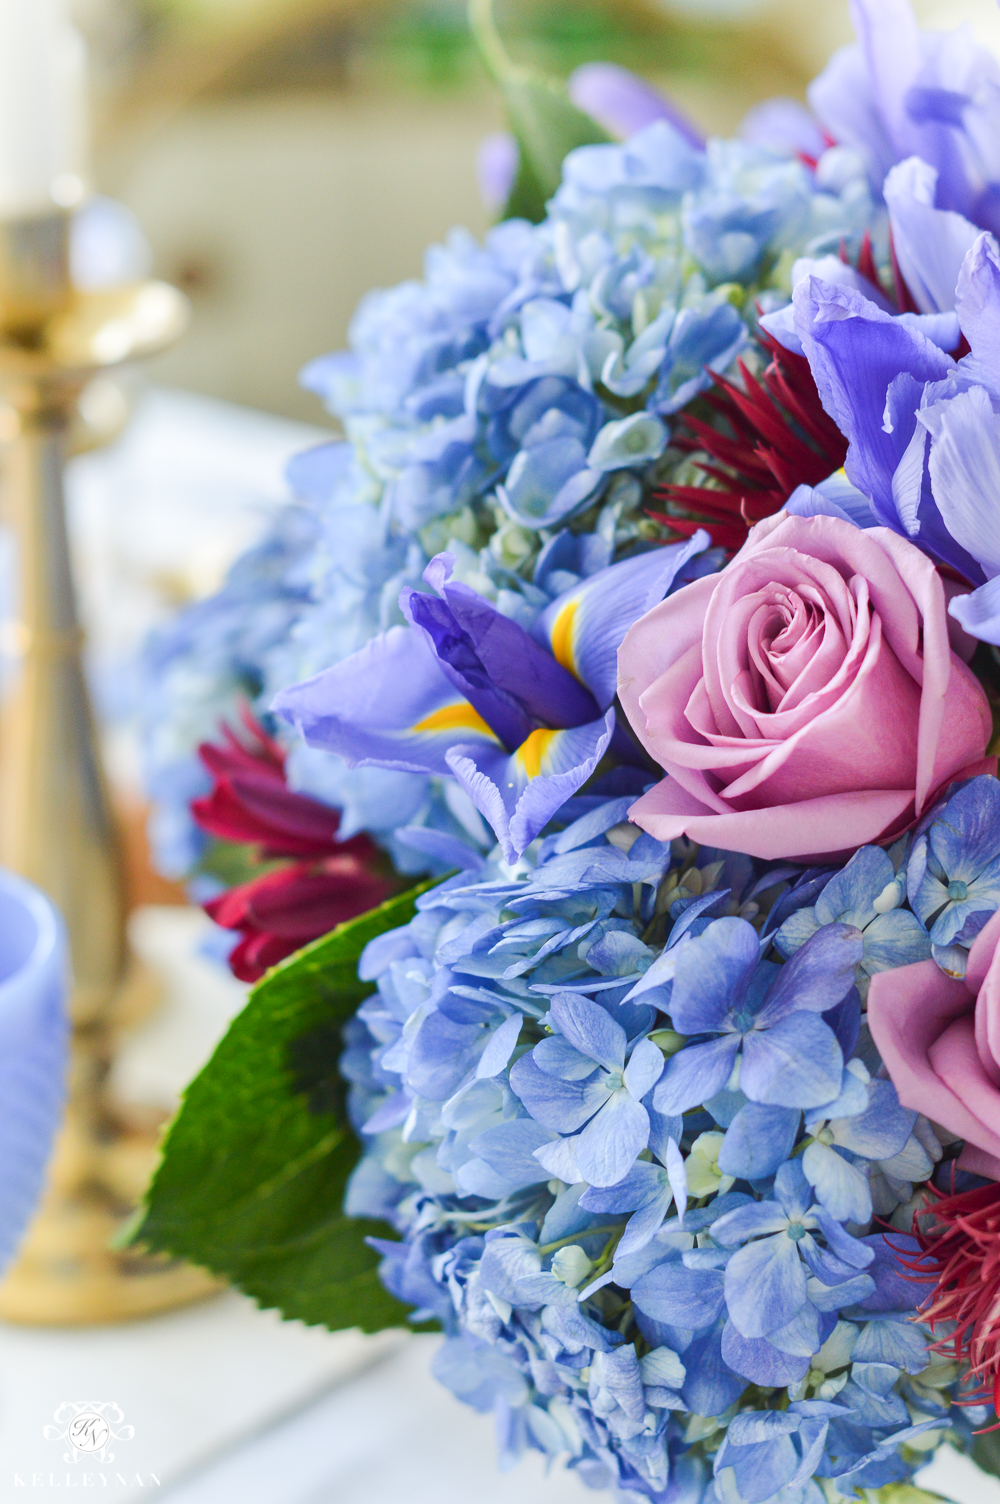 blue hydrangea and purple rose flower arrangement